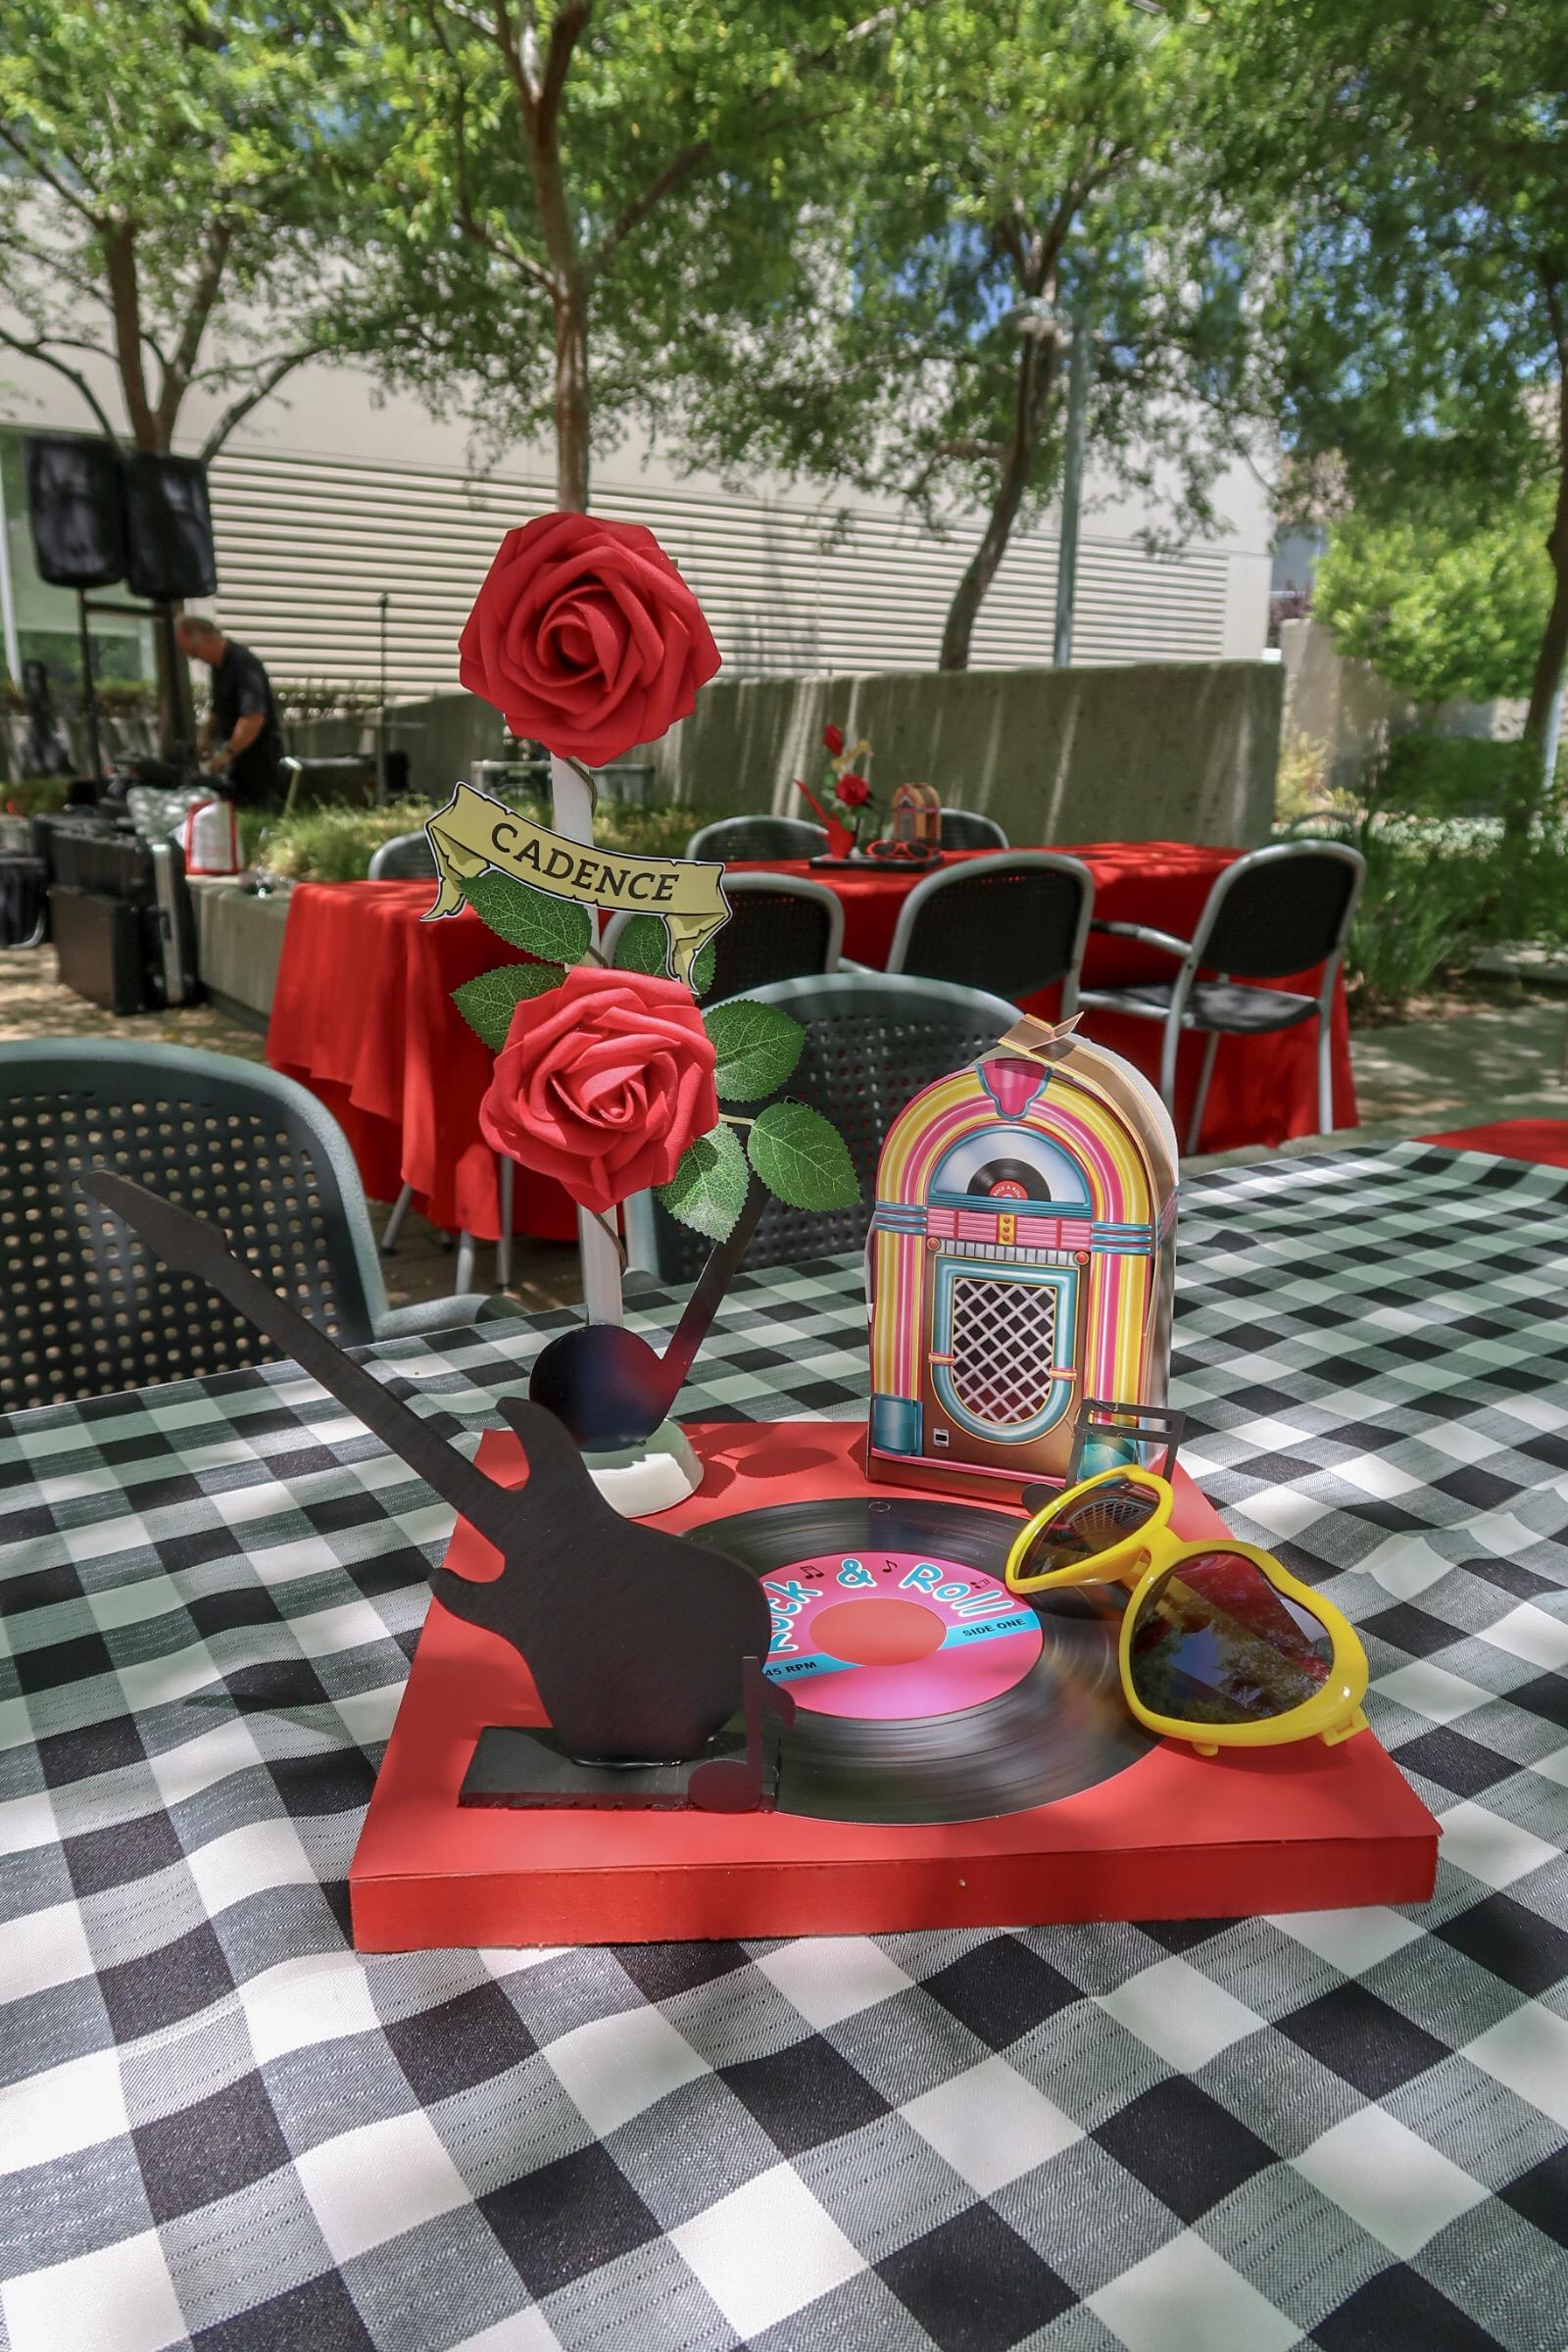 Sarsie's Parties 06-13-19 Cadence Music Fest